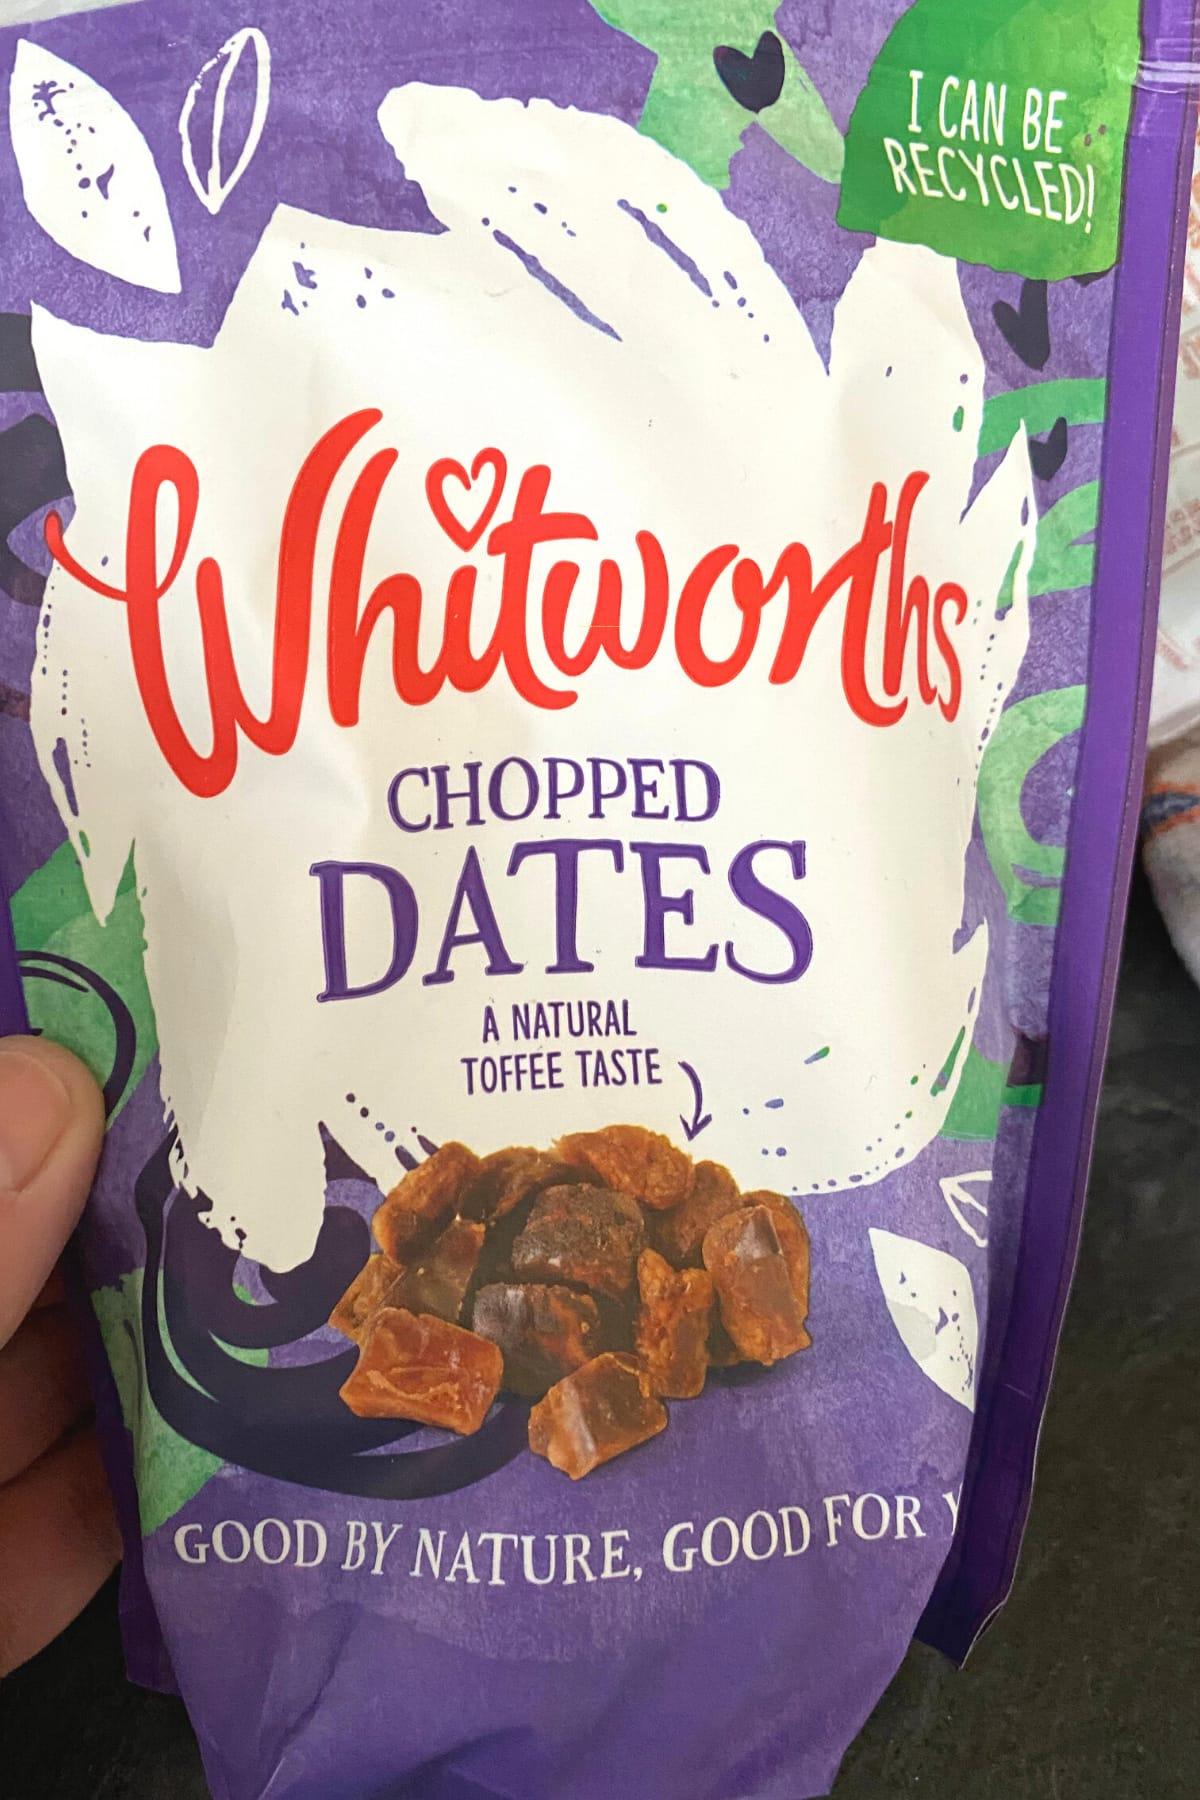 Chopped dates ingredients